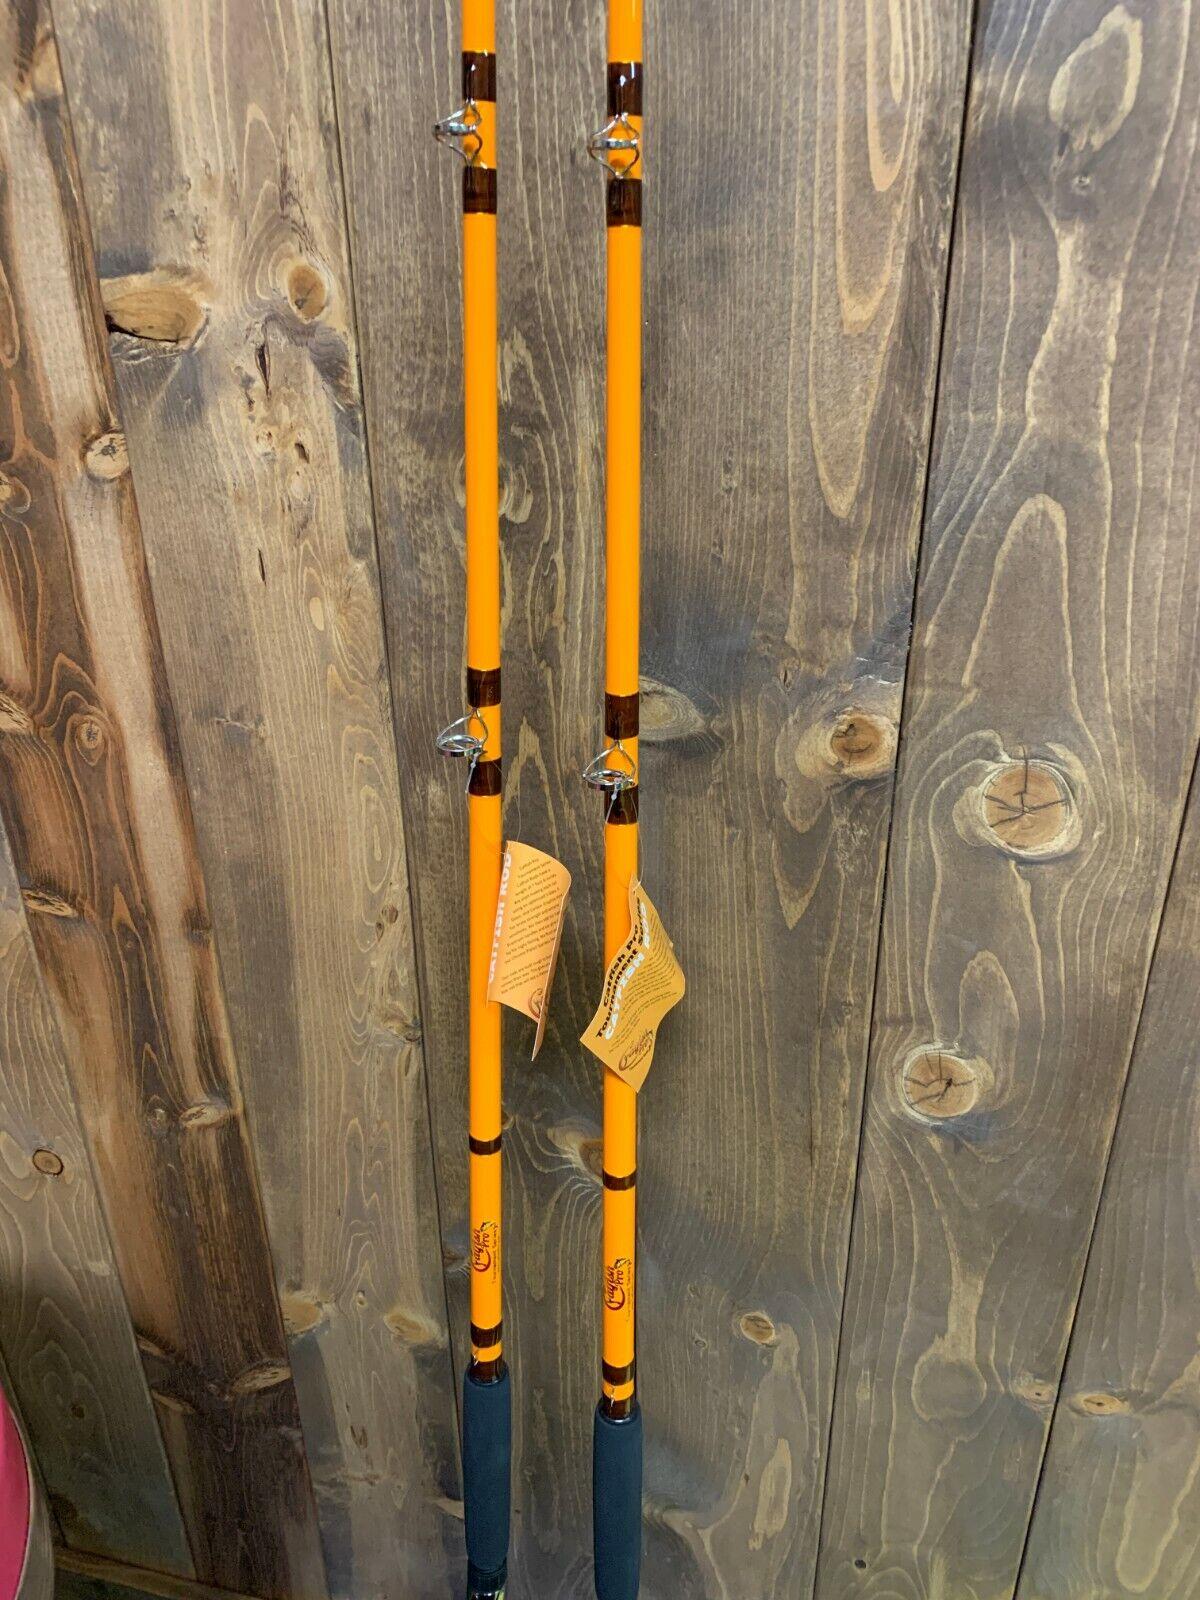 Catfish Pro Tournament Series Casting Fishing Rod 7'6 Heavy